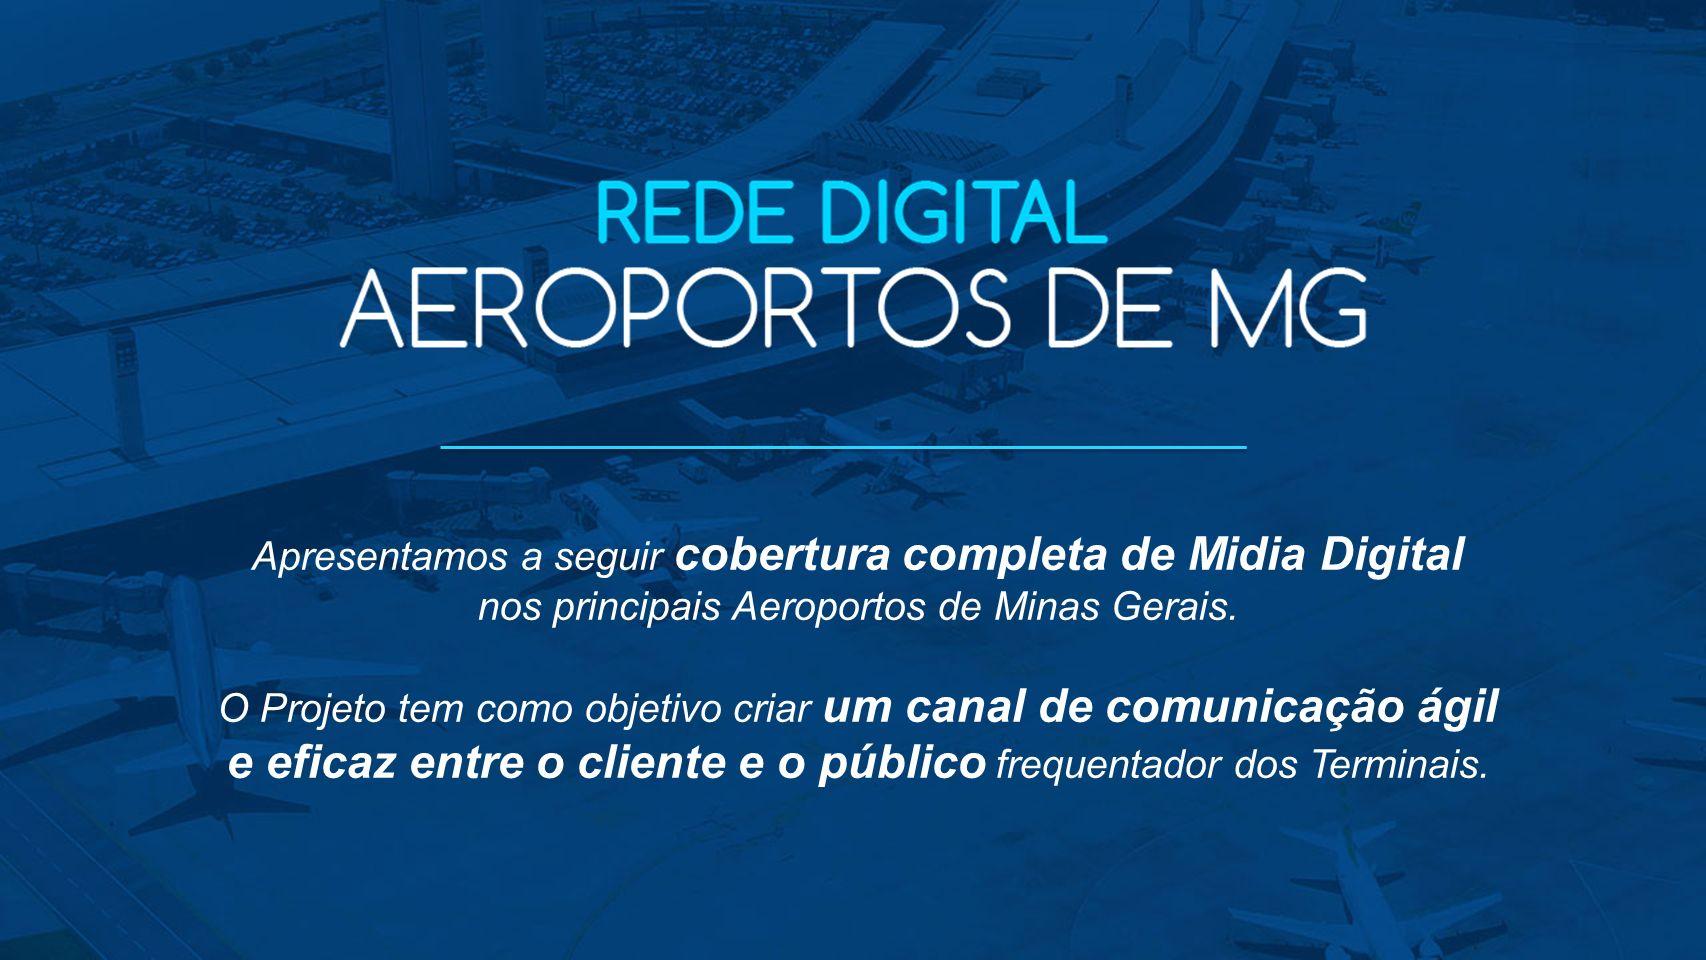 Apresentamos a seguir cobertura completa de Midia Digital